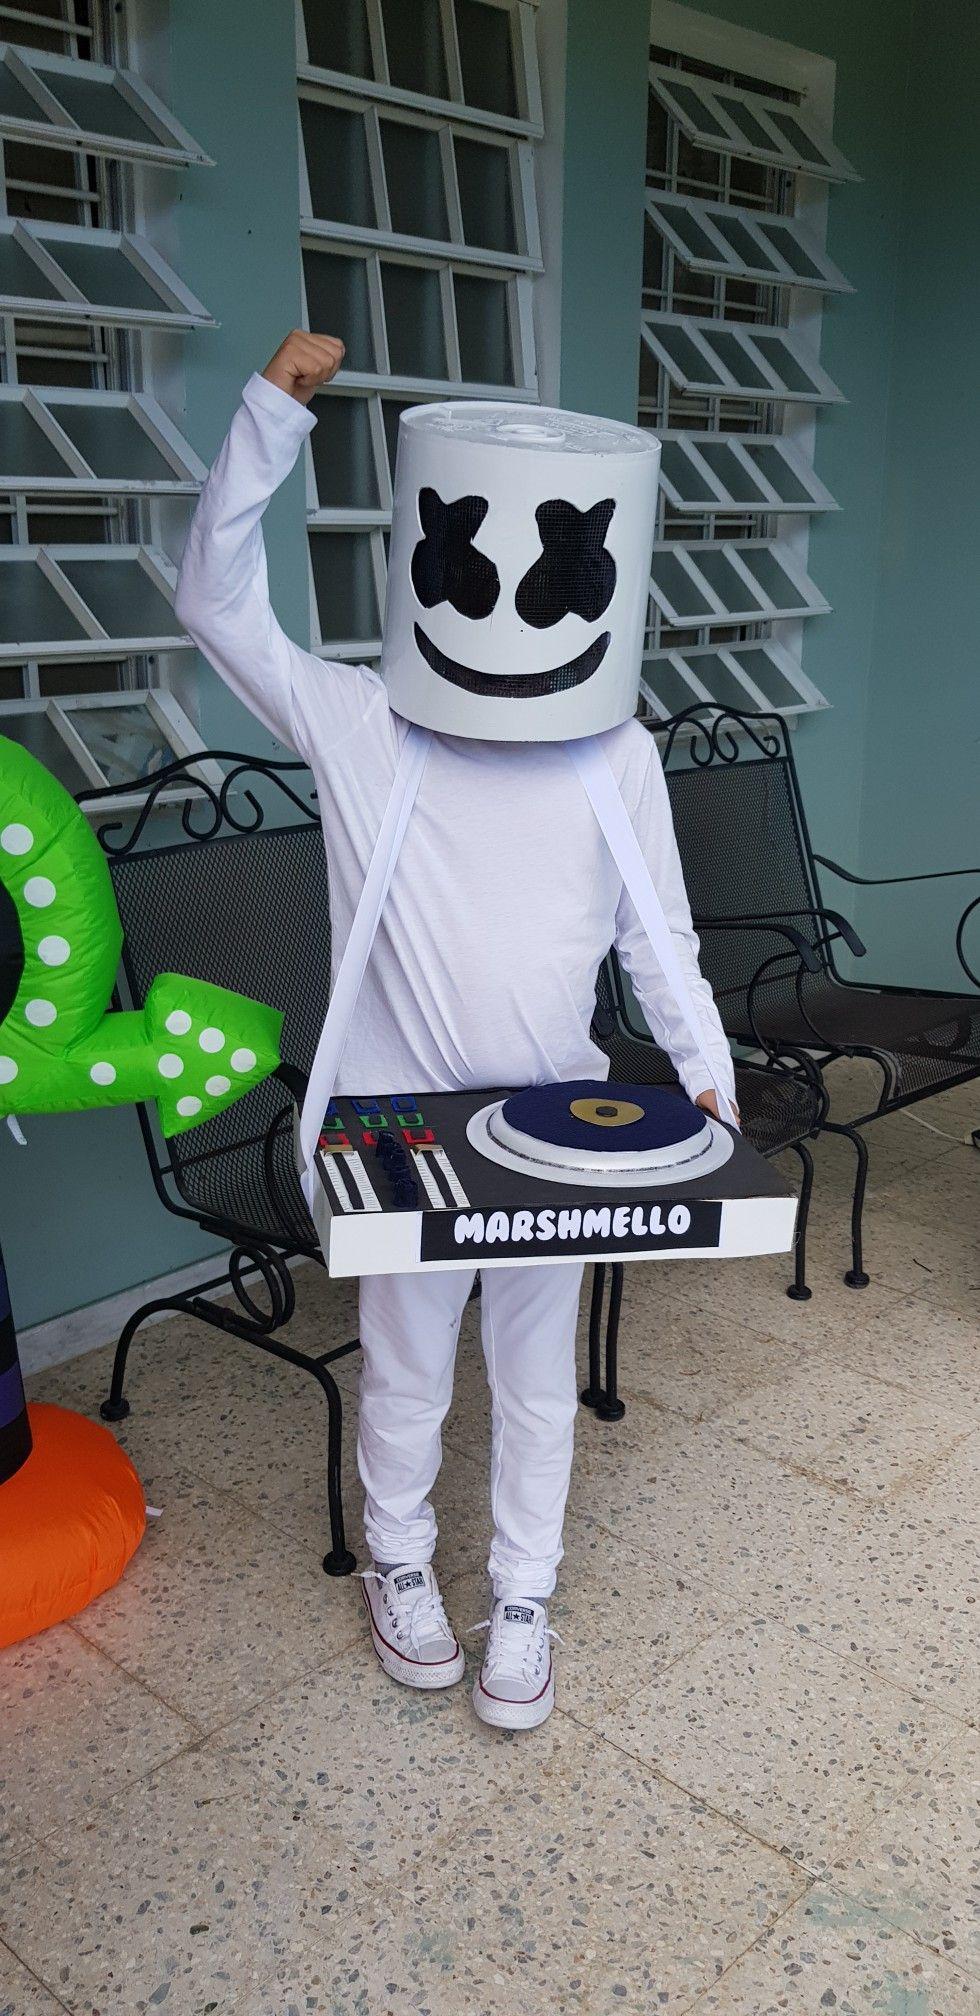 Marshmello Halloween 2020 kids marshmello costume in 2020 | Diy costumes kids, Boys